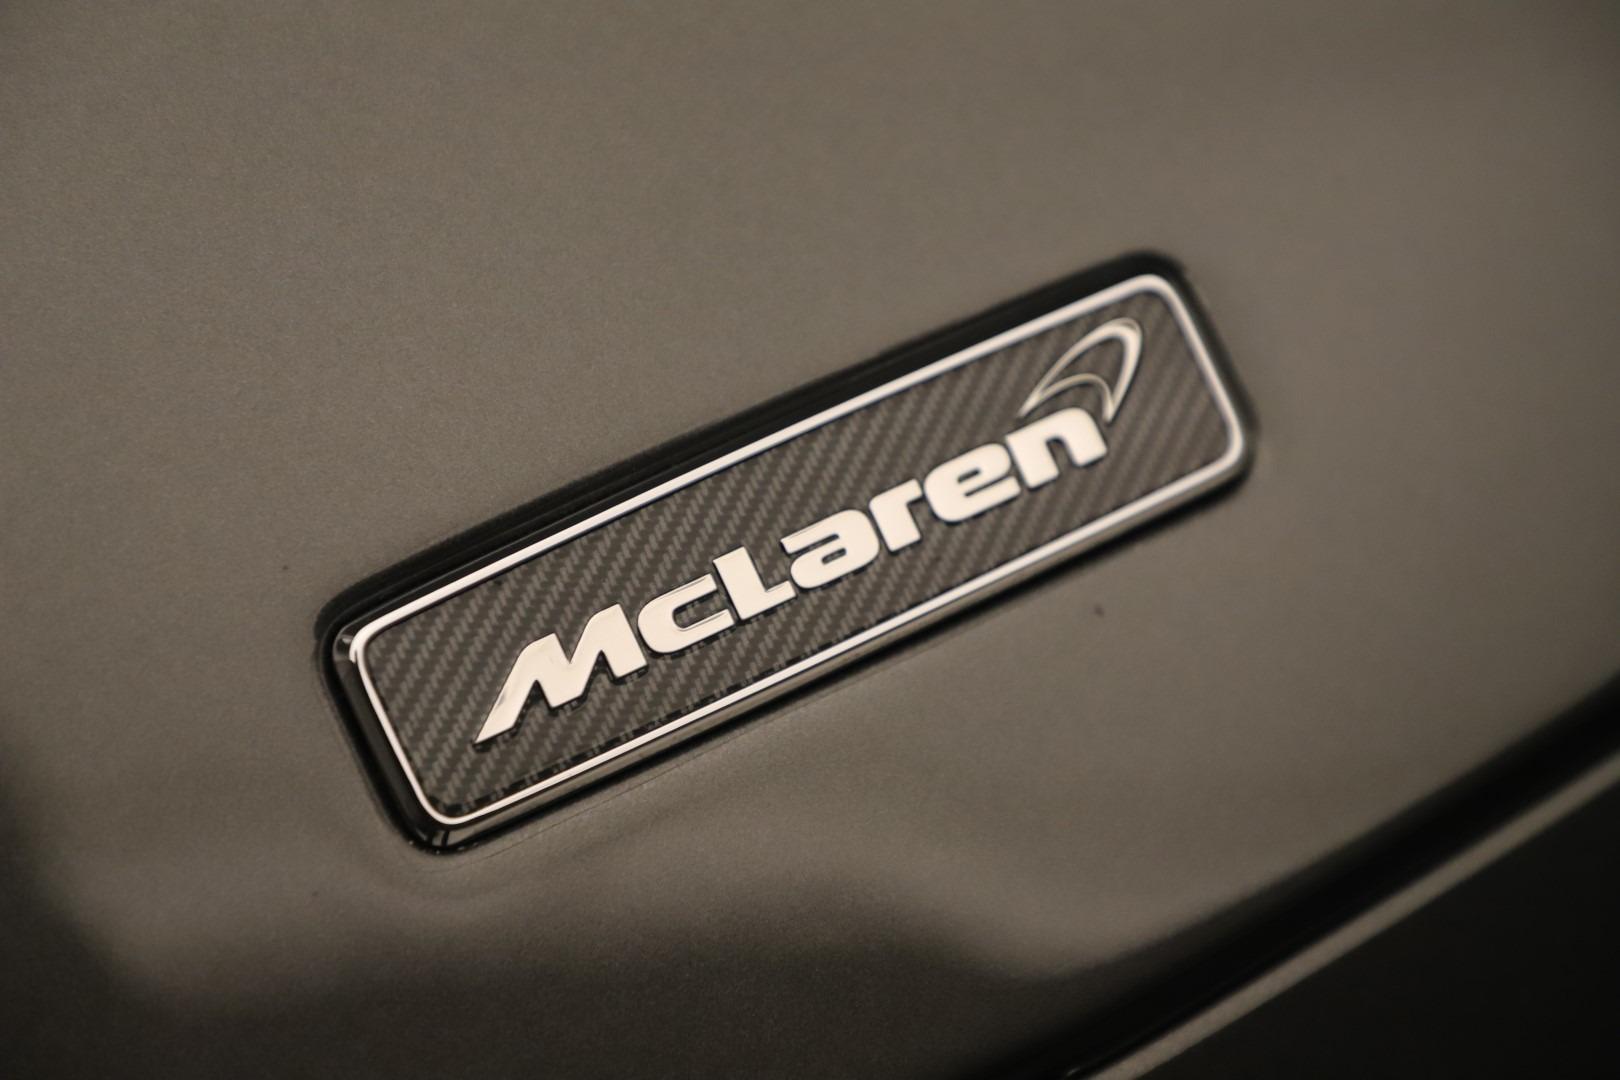 Used 2017 McLaren 570S Coupe For Sale In Westport, CT 3361_p11